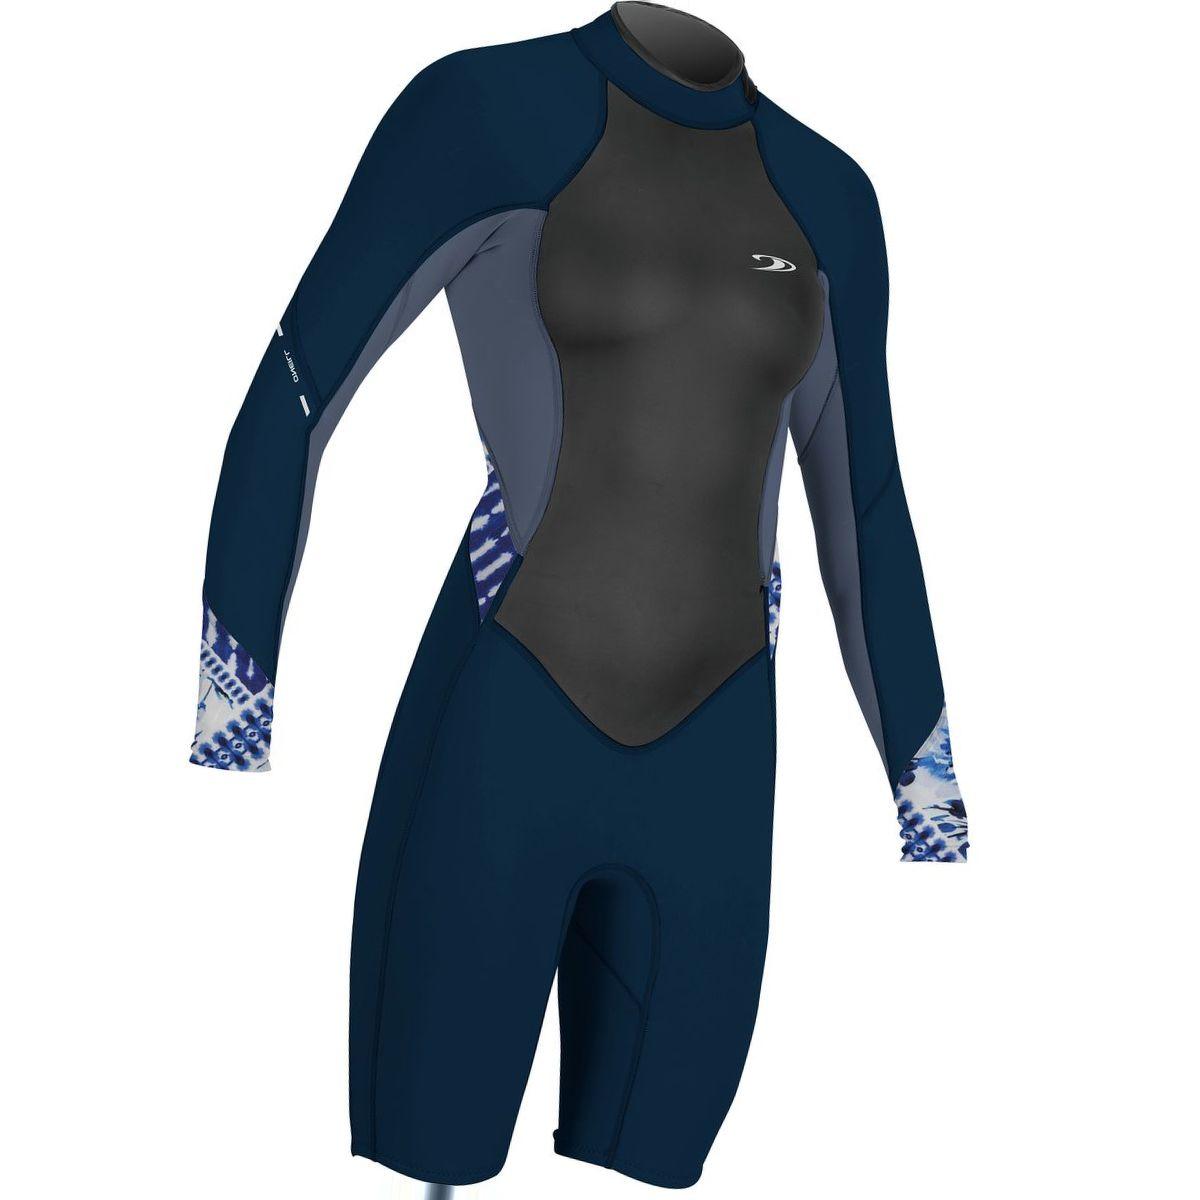 O'Neill Bahia Spring Wetsuit - Long-Sleeve - Women's